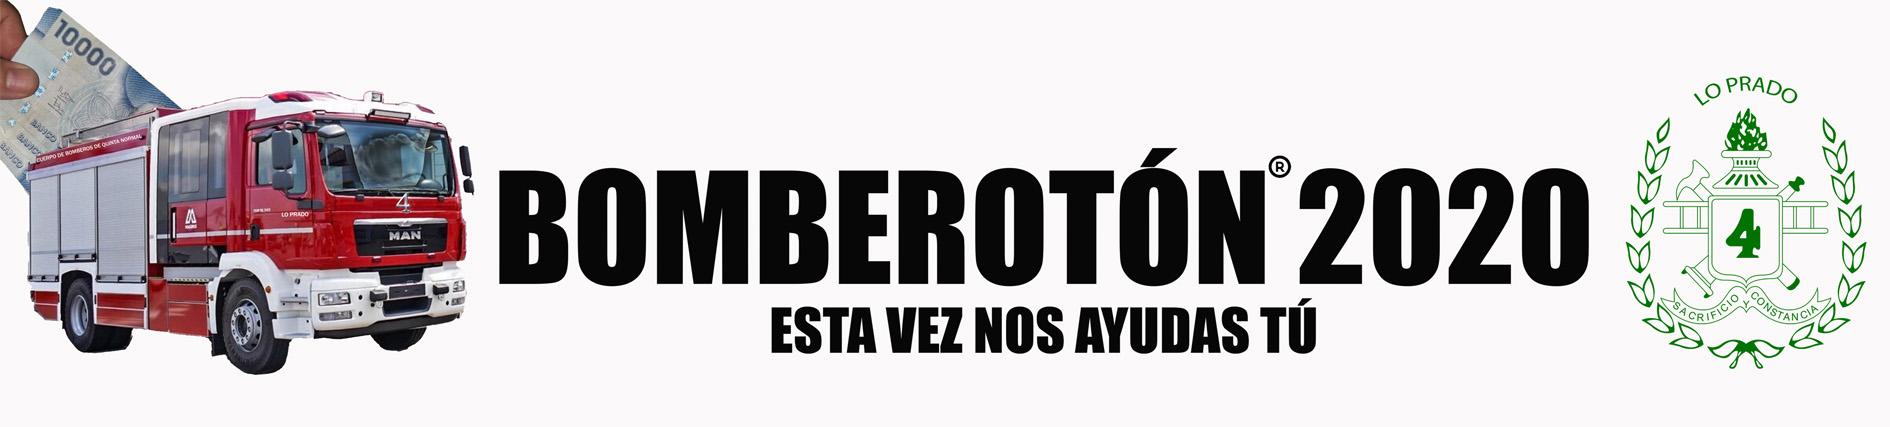 BOMBEROTÓN 2020